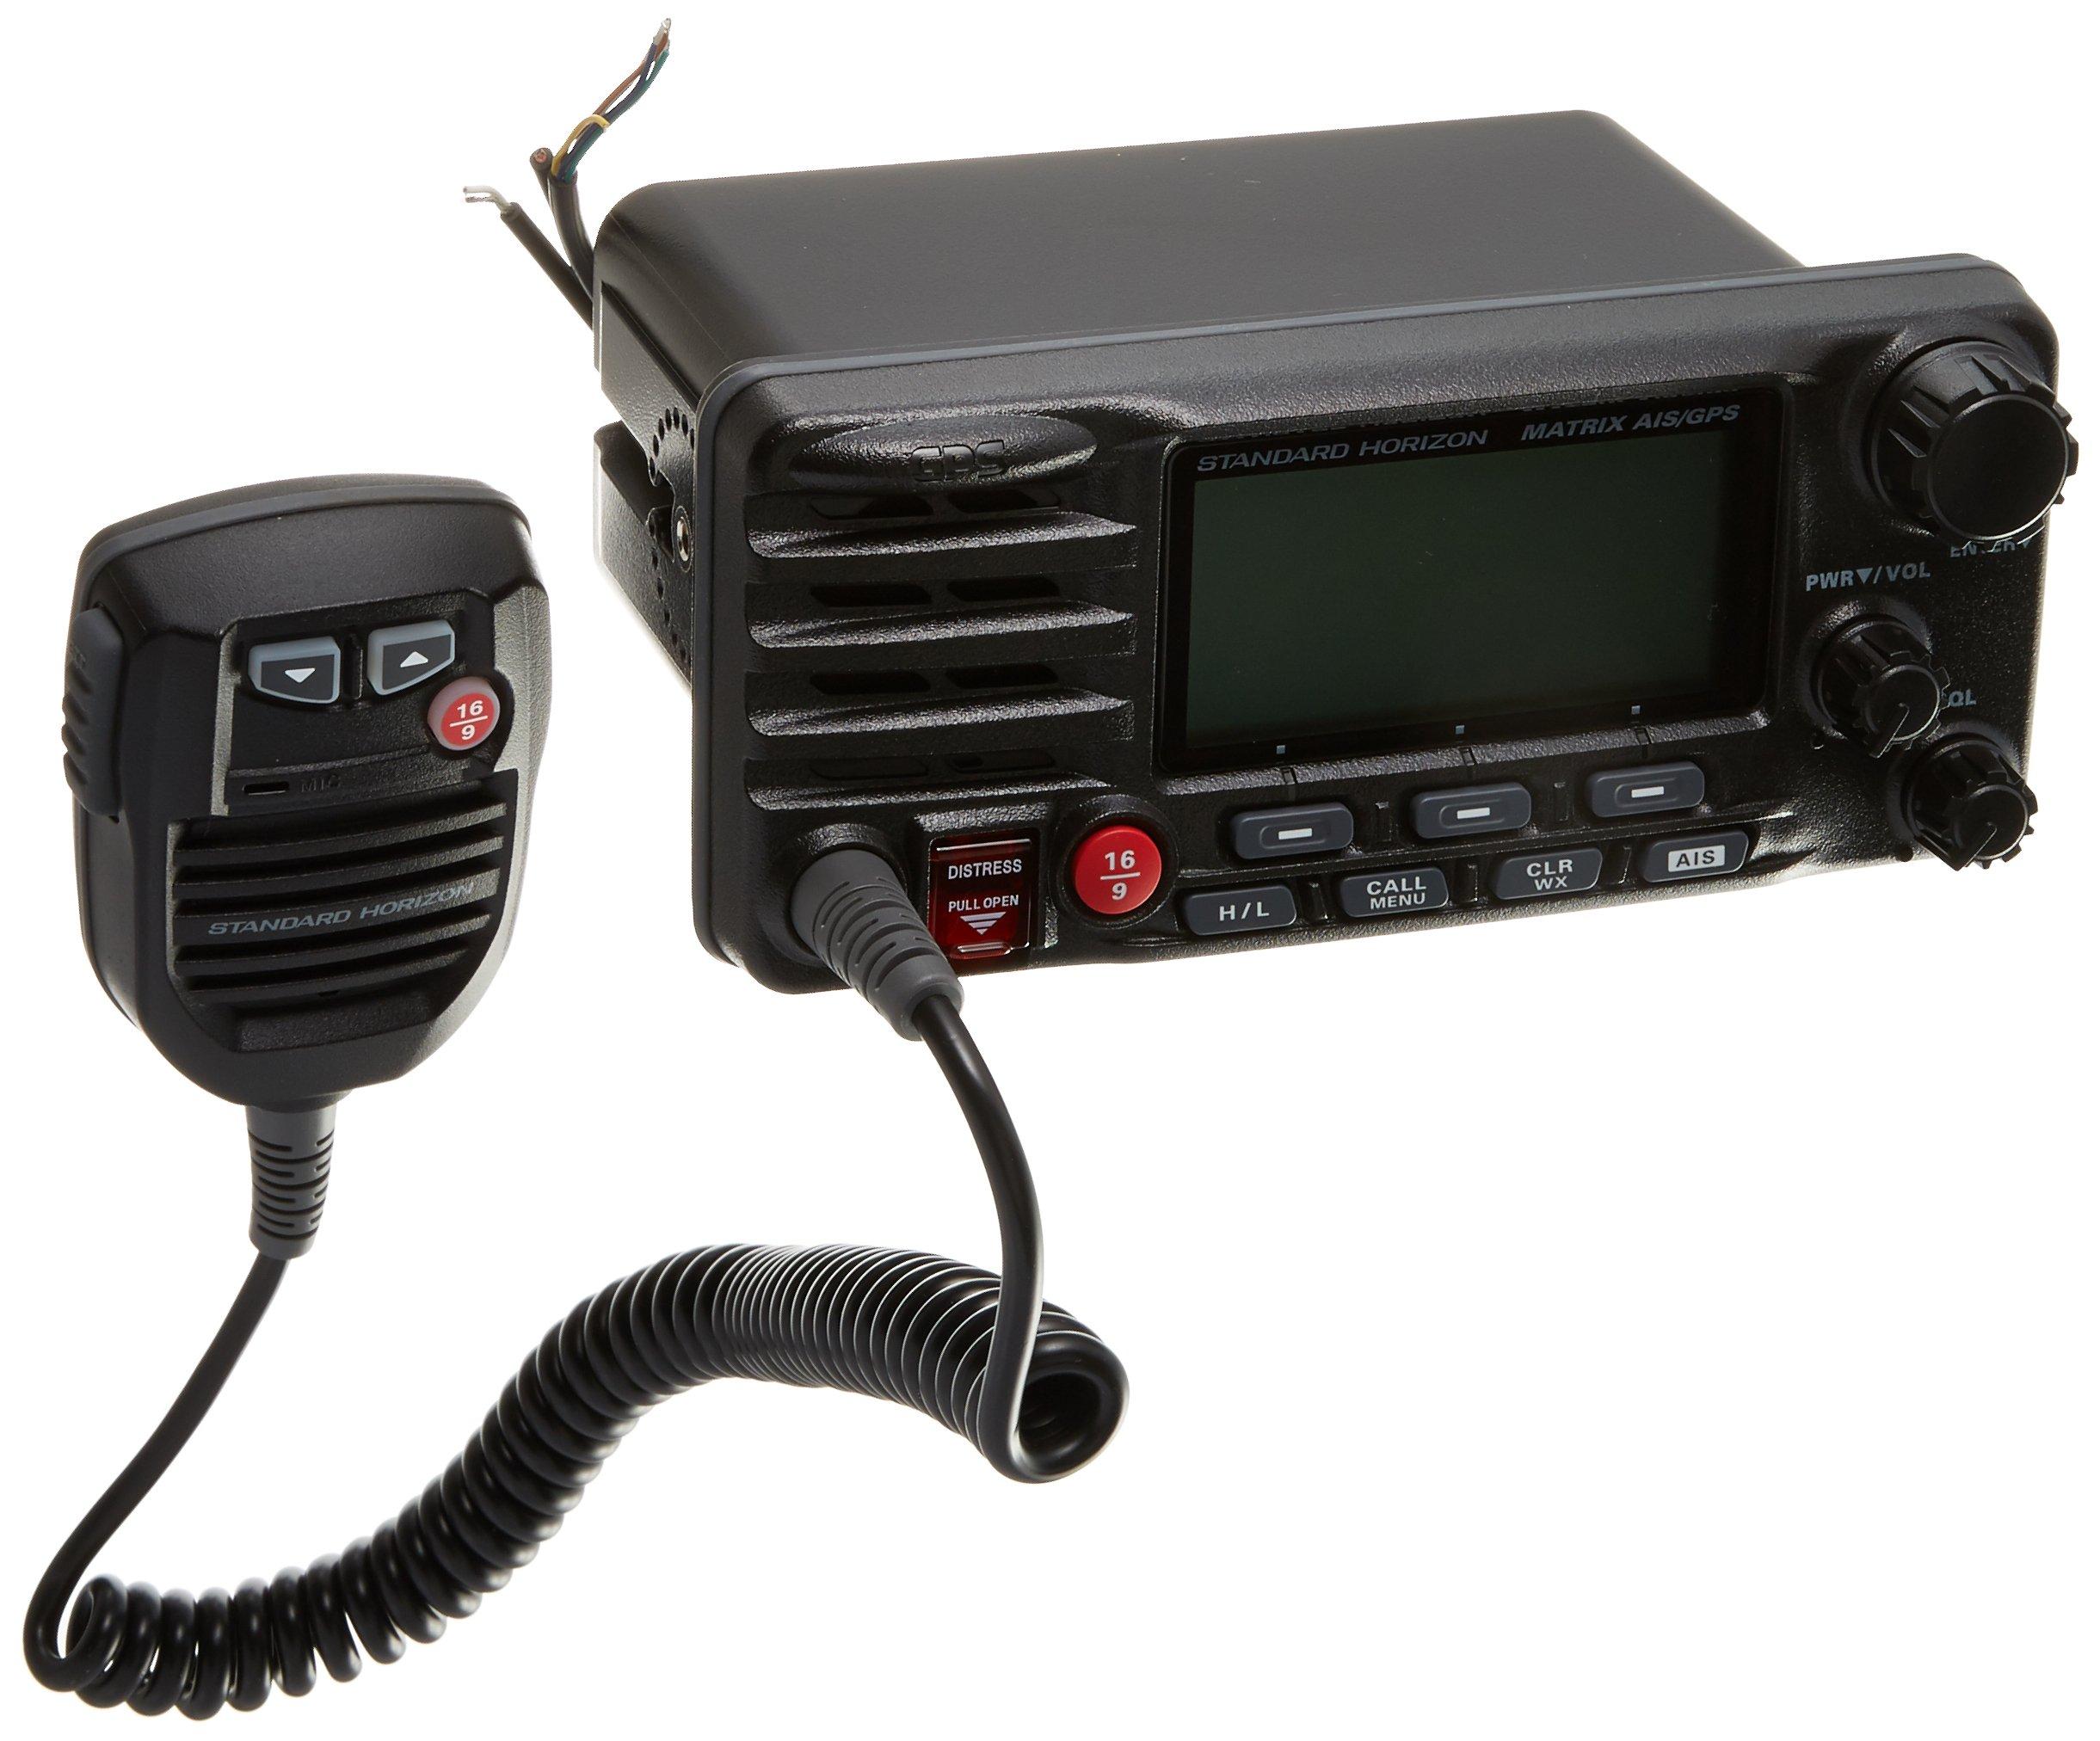 Standard Horizon GX2200B Standard Matrix AIS/GPS VHF (Black) by Standard Horizon (Image #1)